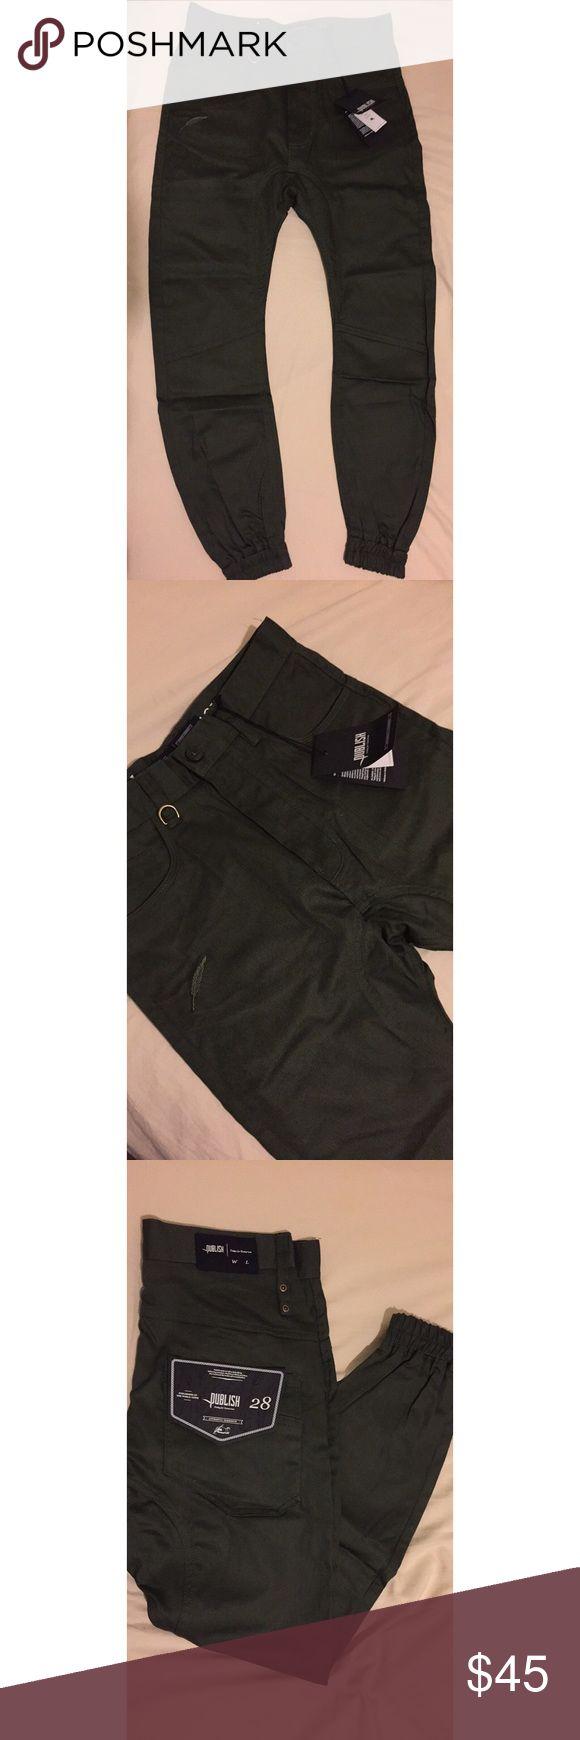 "Publish Brand ""Kelson"" Jogger Pants for Men's Brand New Publish Brand ""Kelson"" Jogger Pants for Men's size 28 - Olive Green Publish Pants Sweatpants & Joggers"